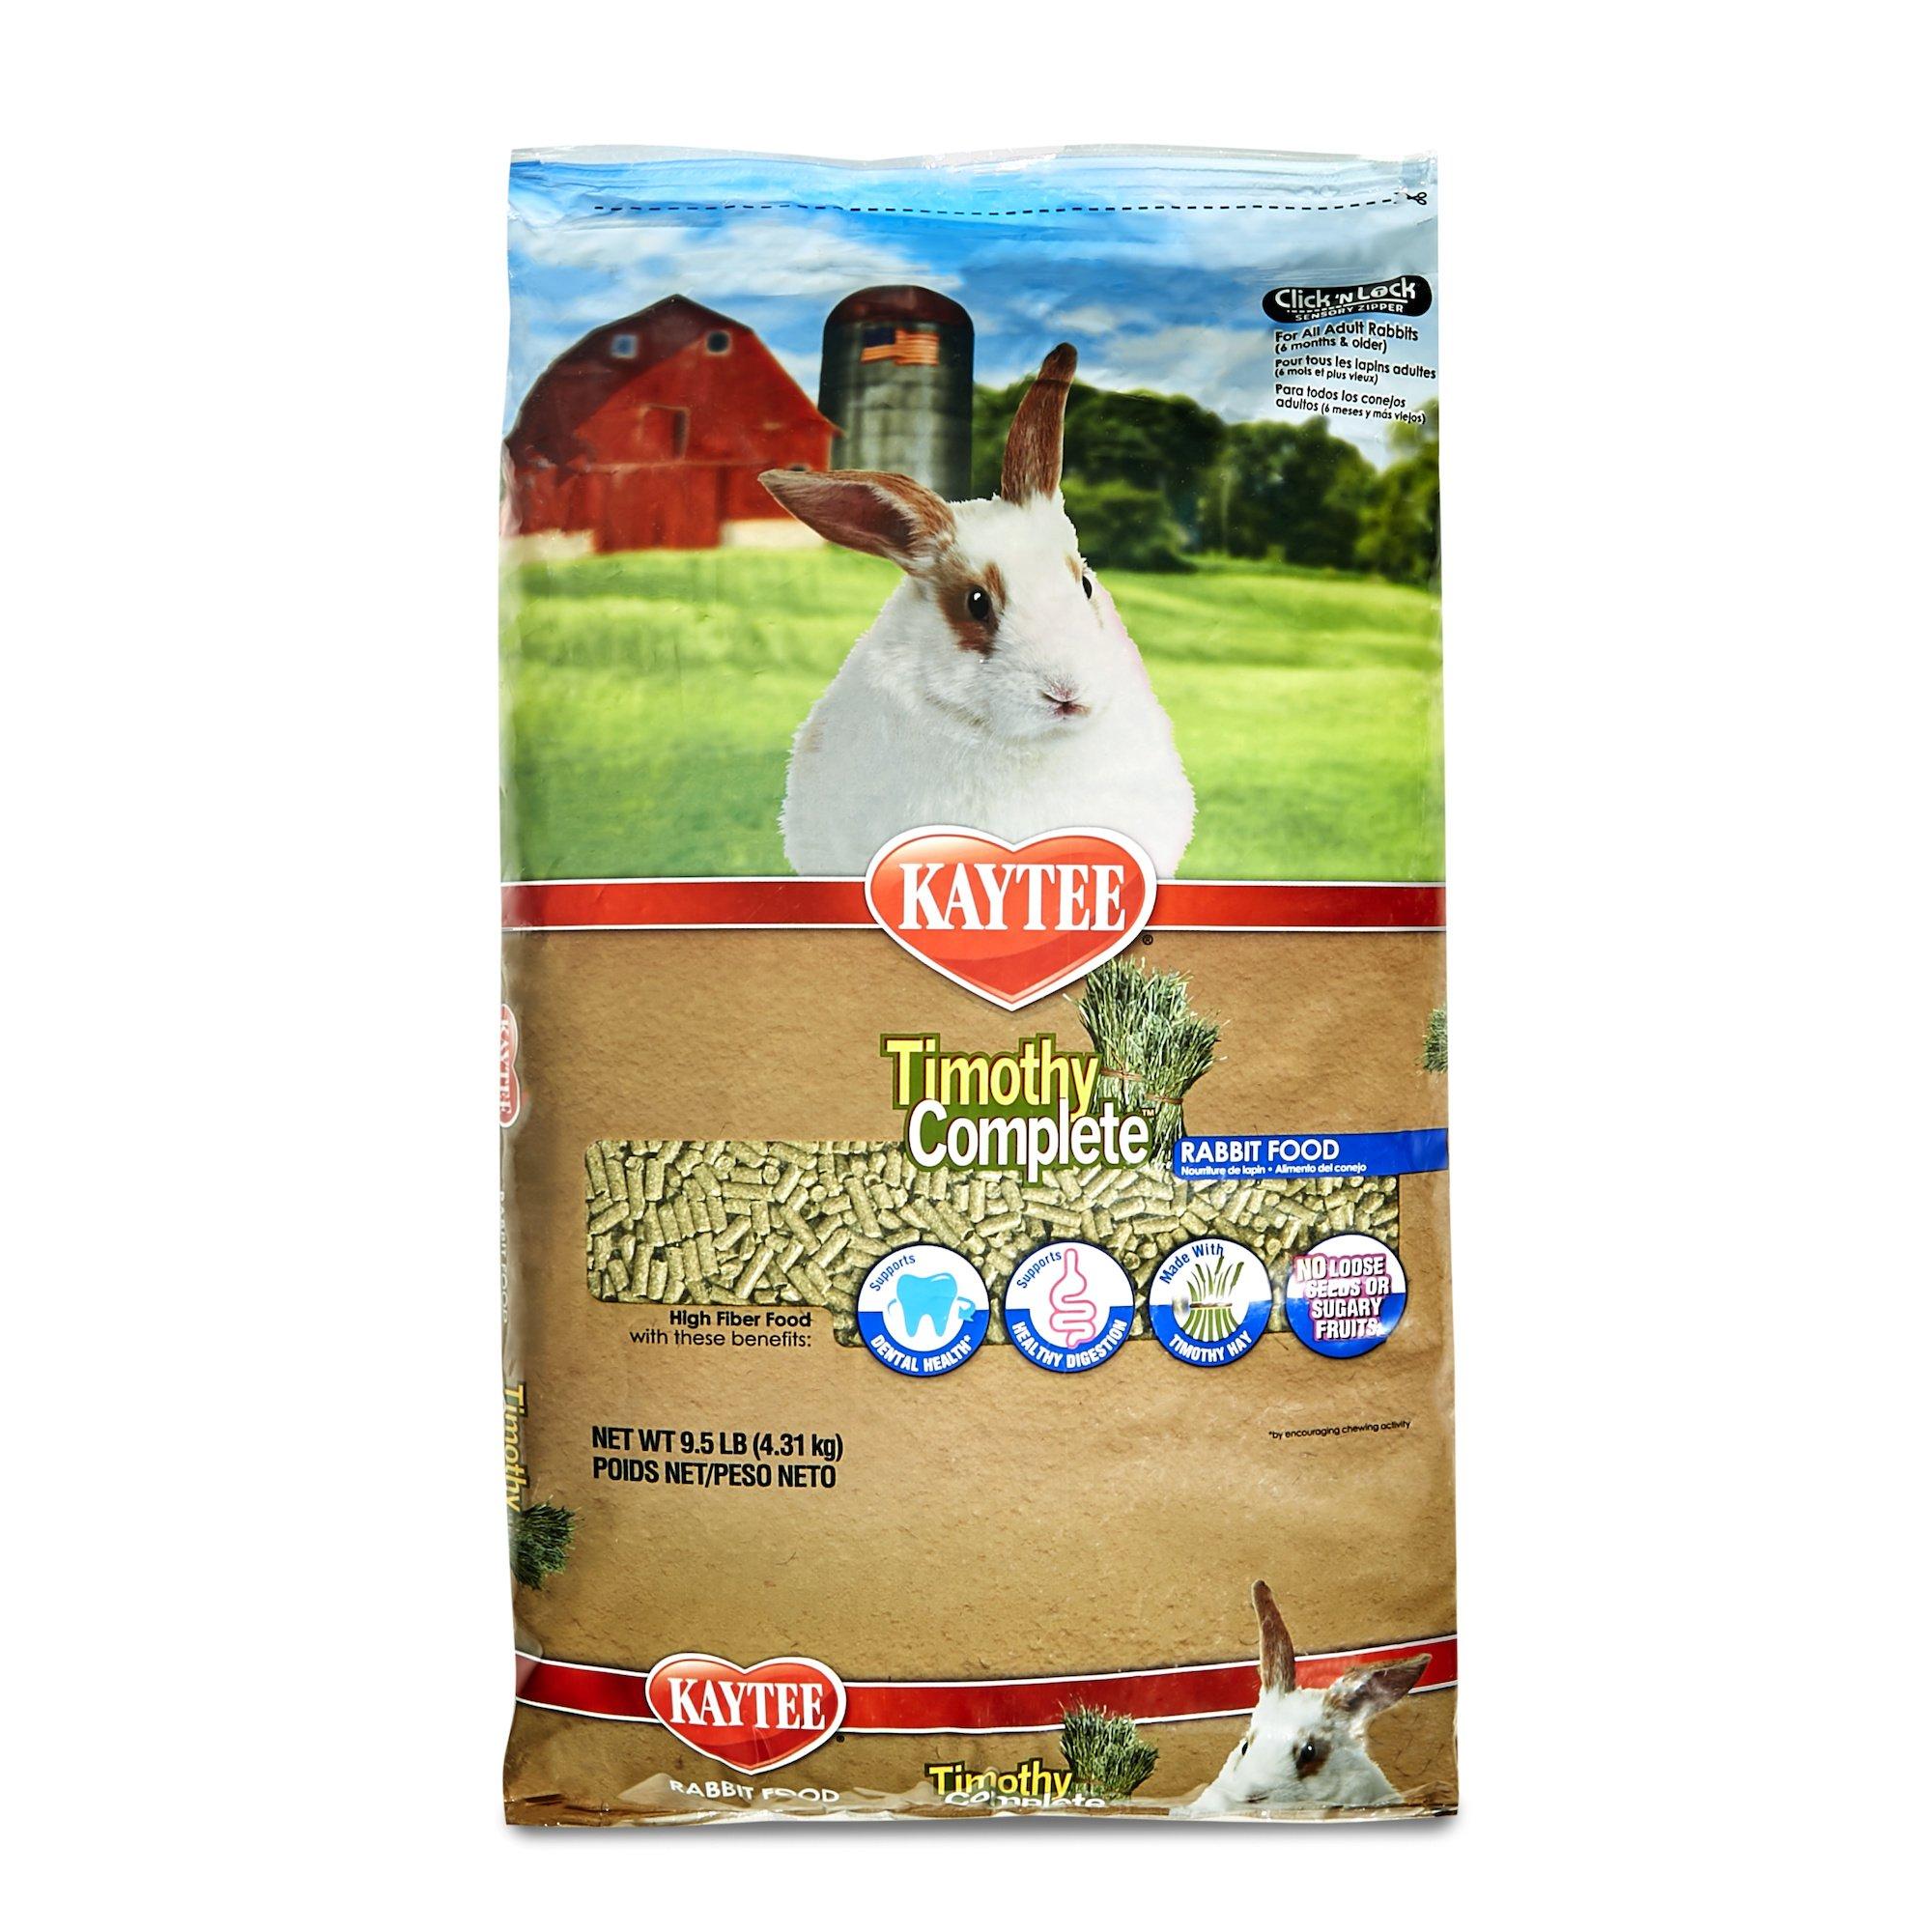 Kaytee Timothy Hay Complete Rabbit Food, 9.5-lb bag